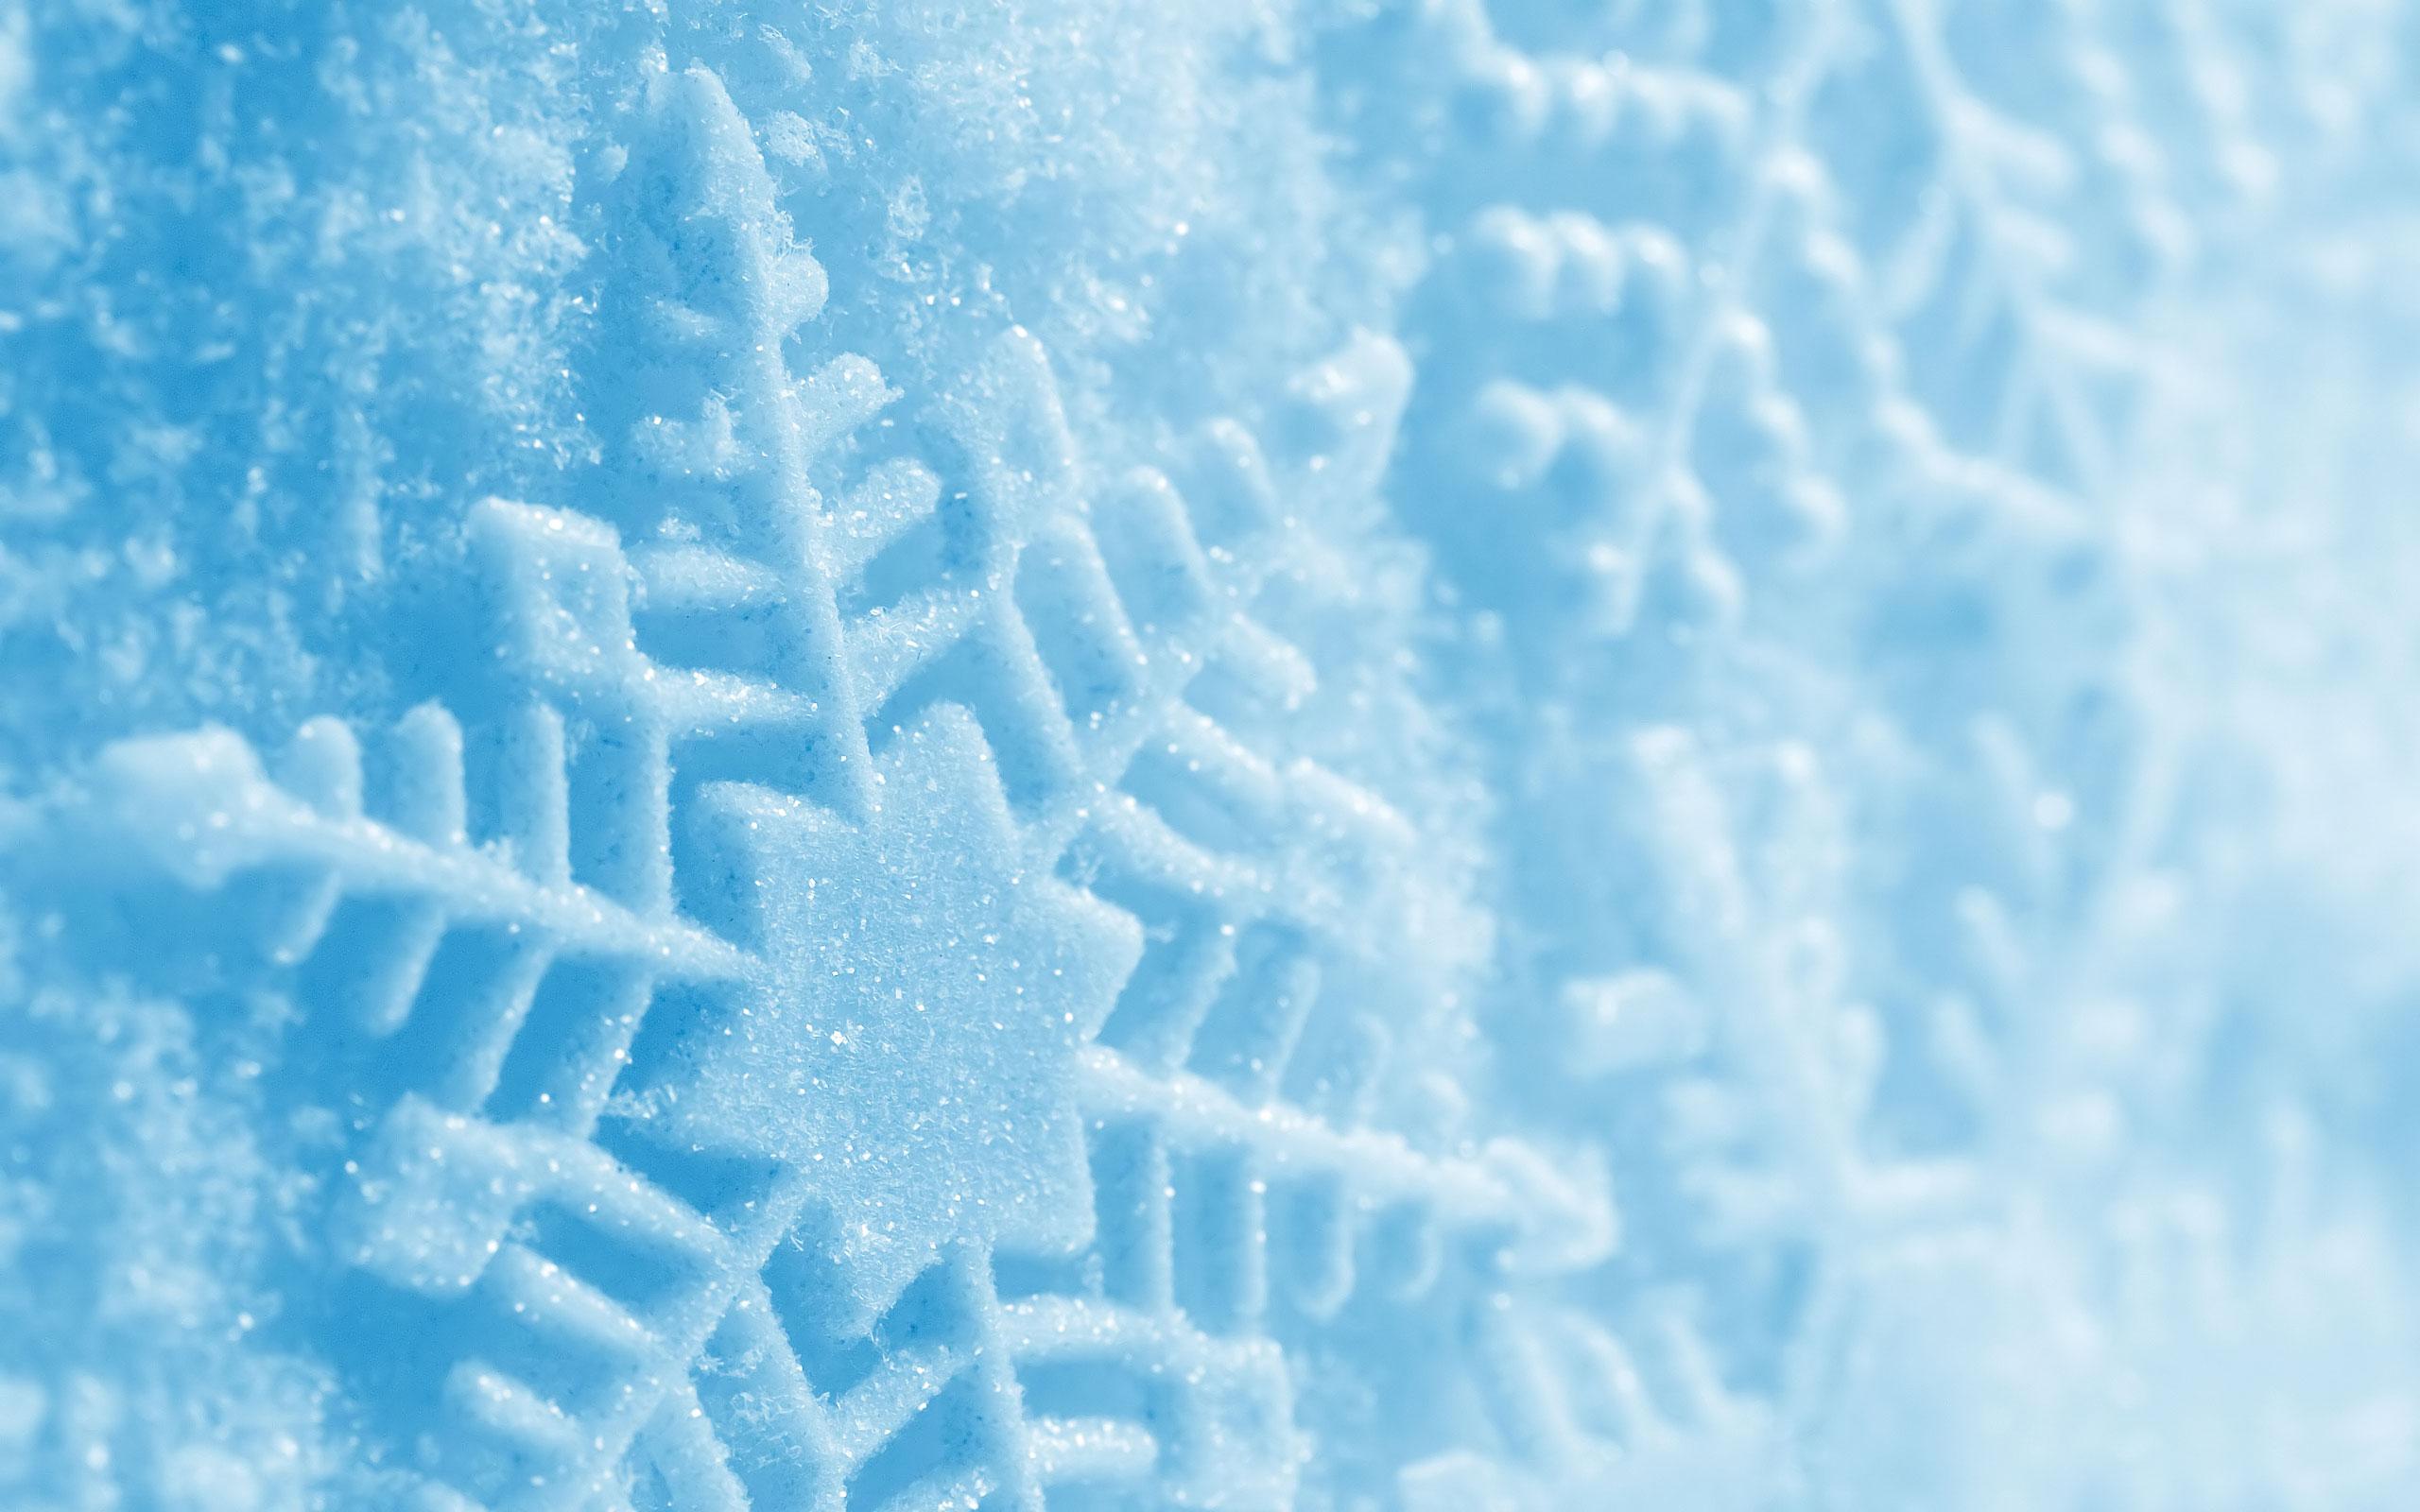 Snow Computer Wallpaper Clipart.